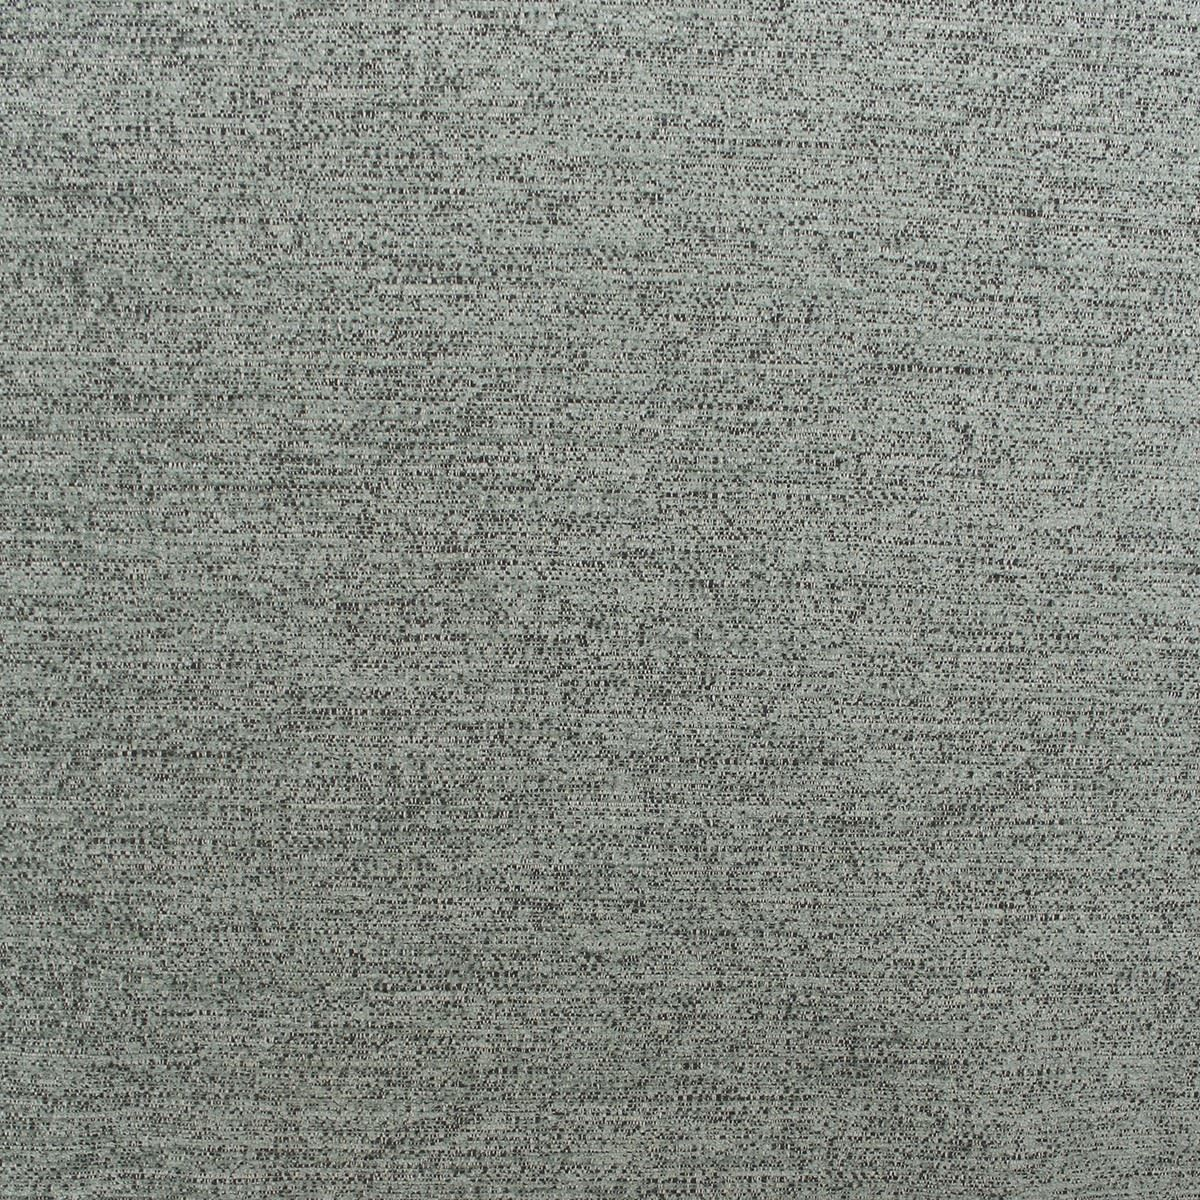 Amalia Semi Plain Slubbed Velvet Chenille Turquoise Melange FR Upholstery Fabric